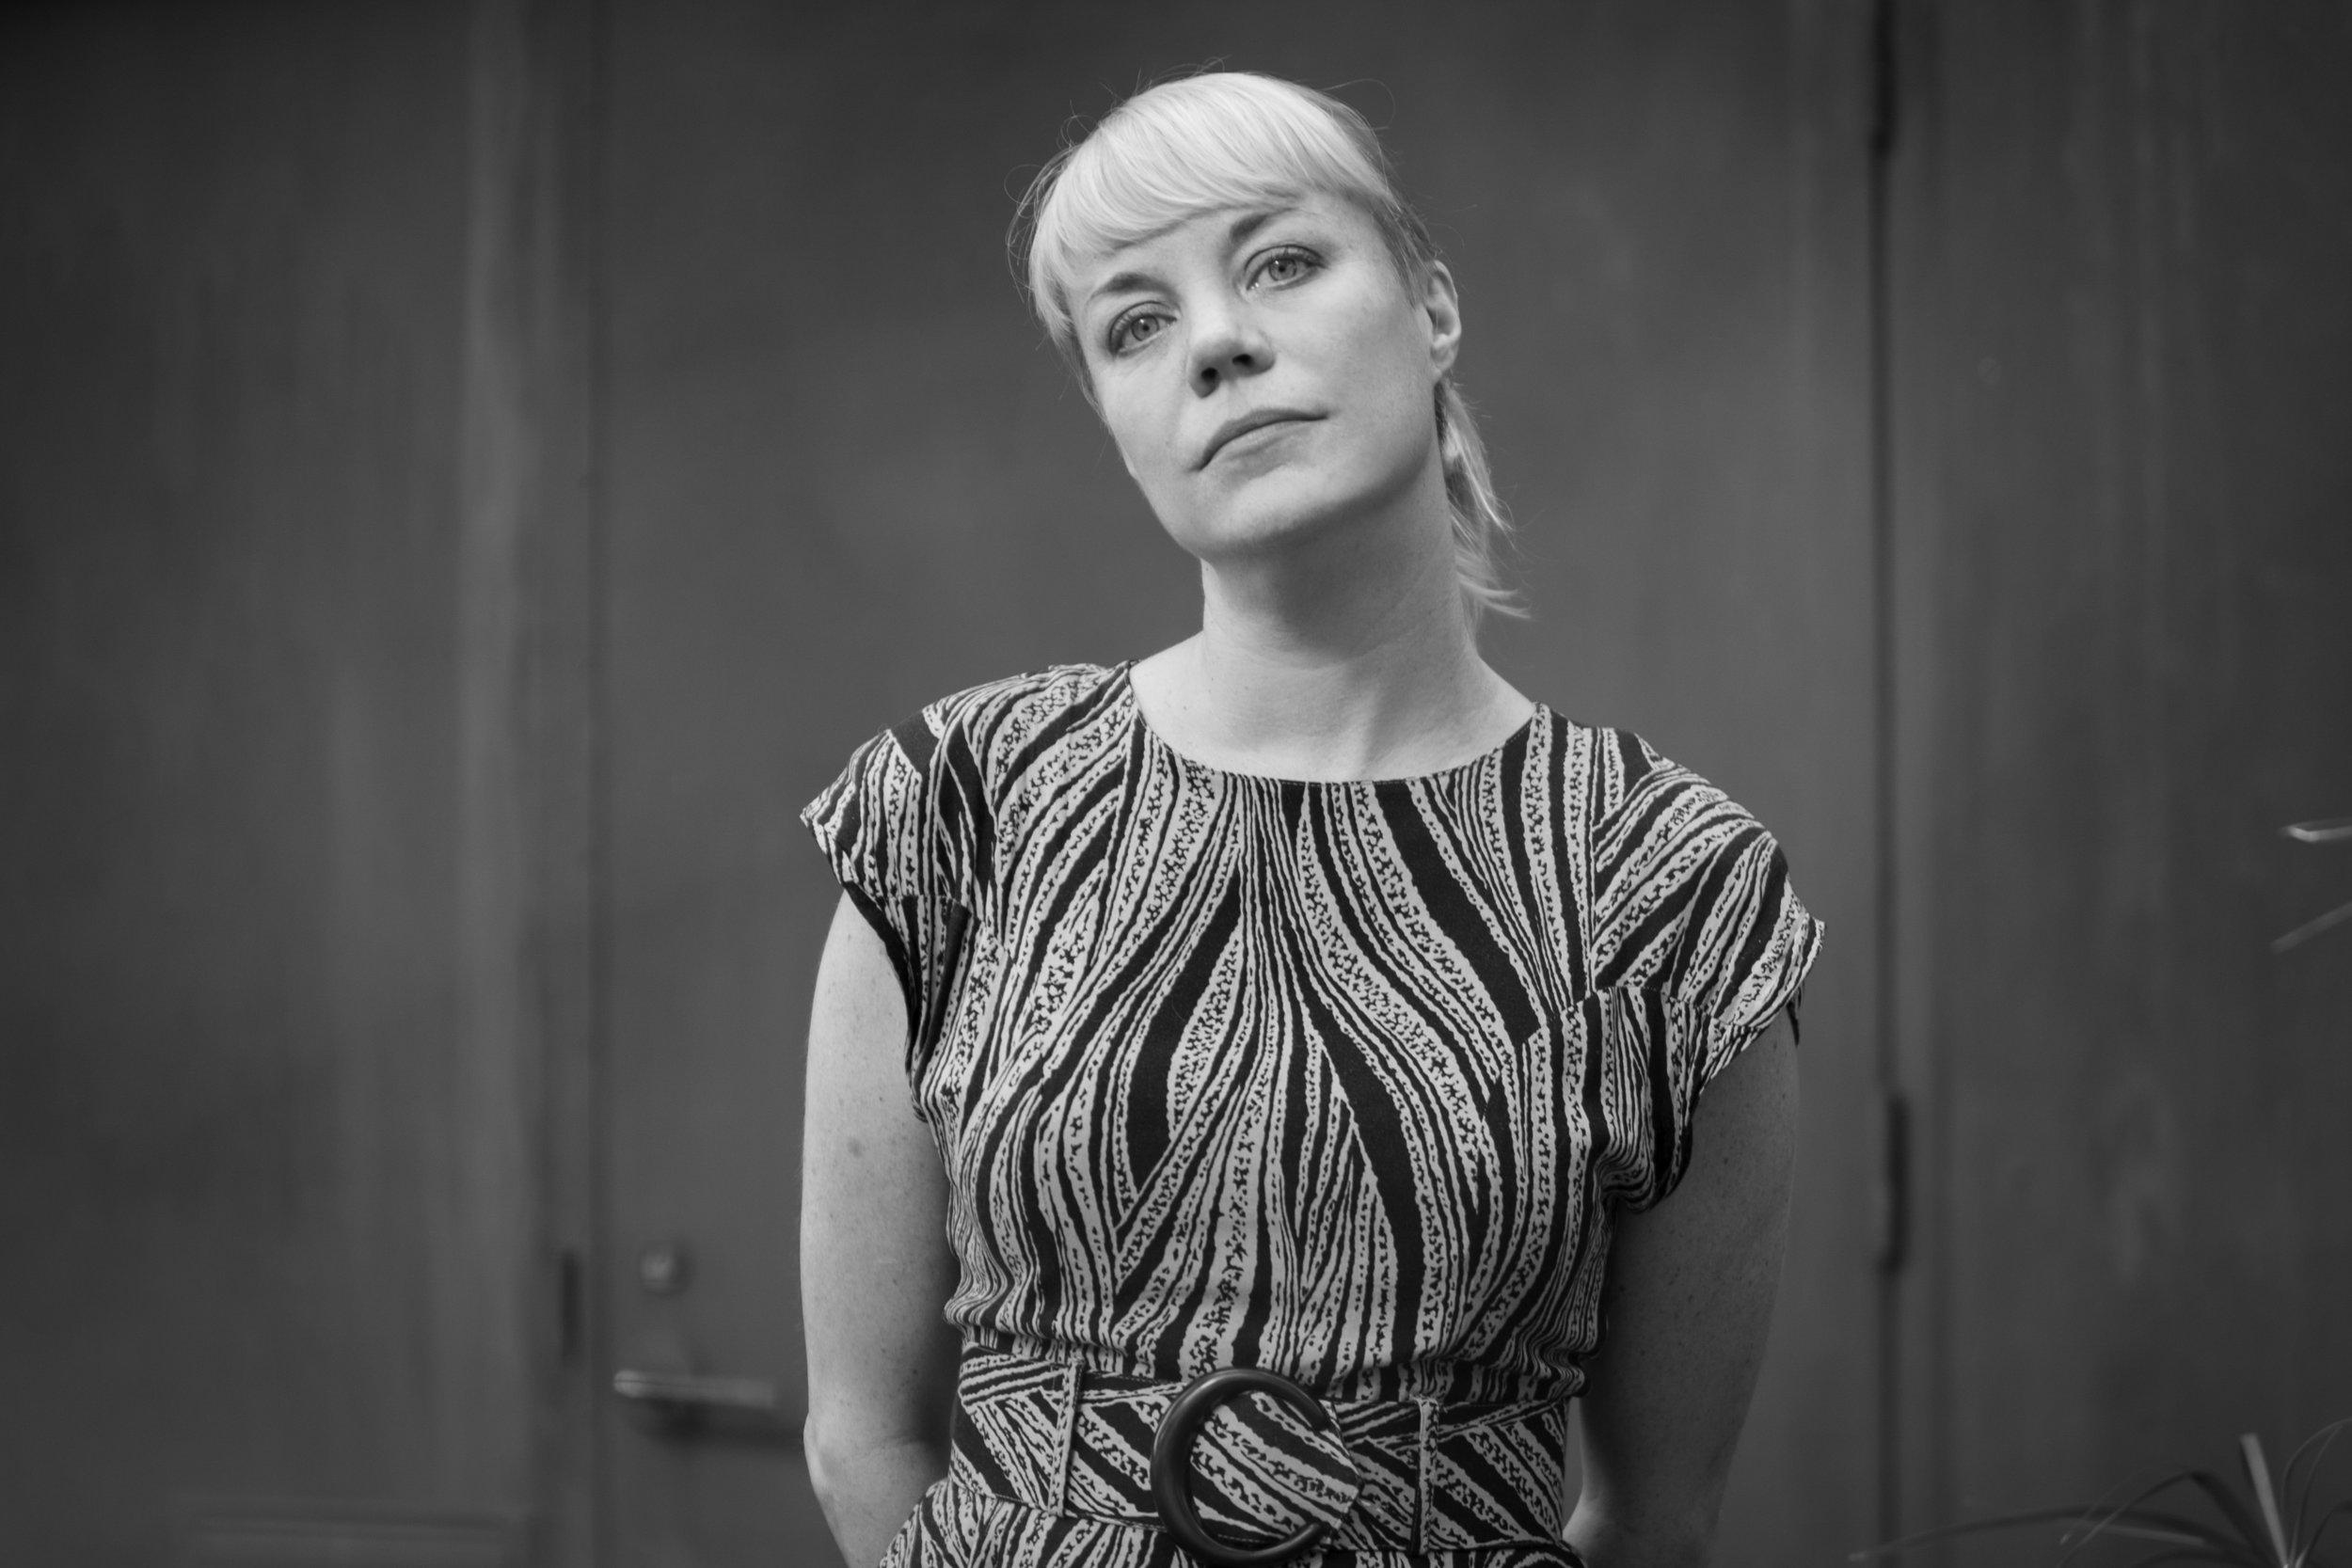 Christina Pettersson